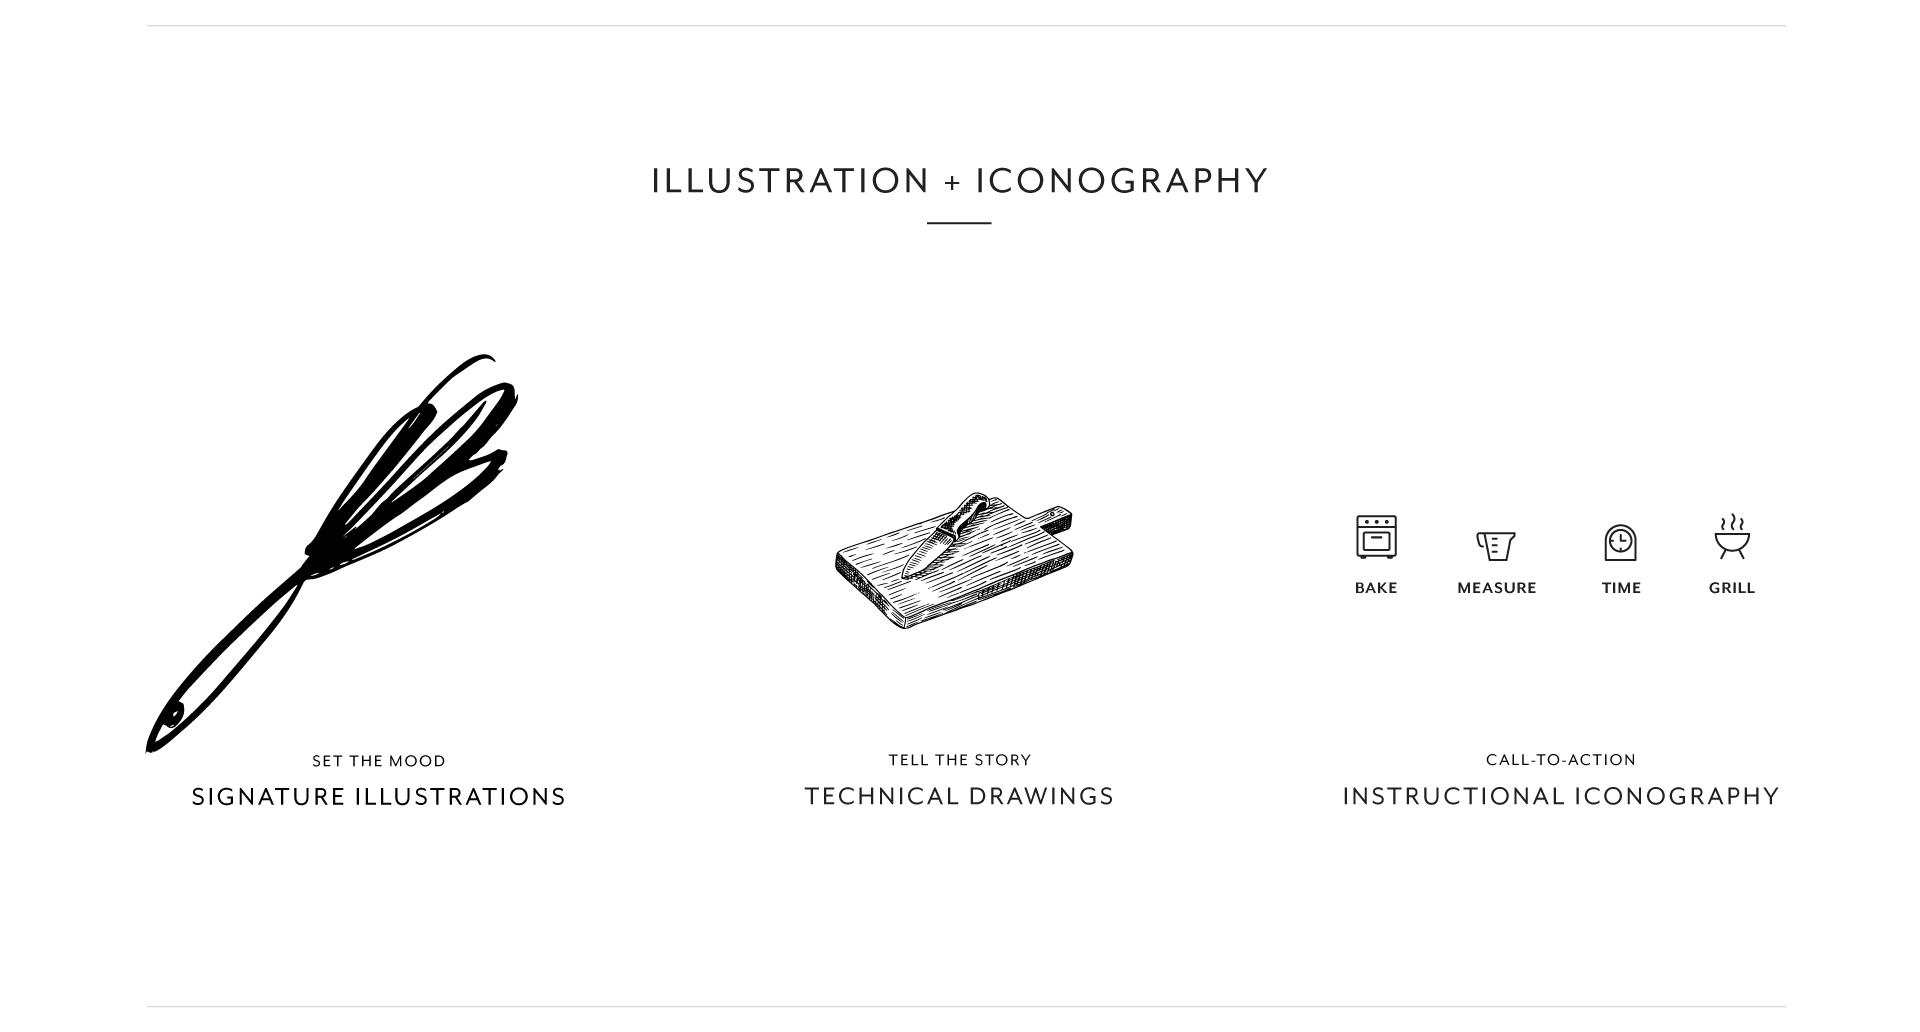 Creative_Retail_Packaging_Branding_Design_Sur_La_Table_4i.jpg